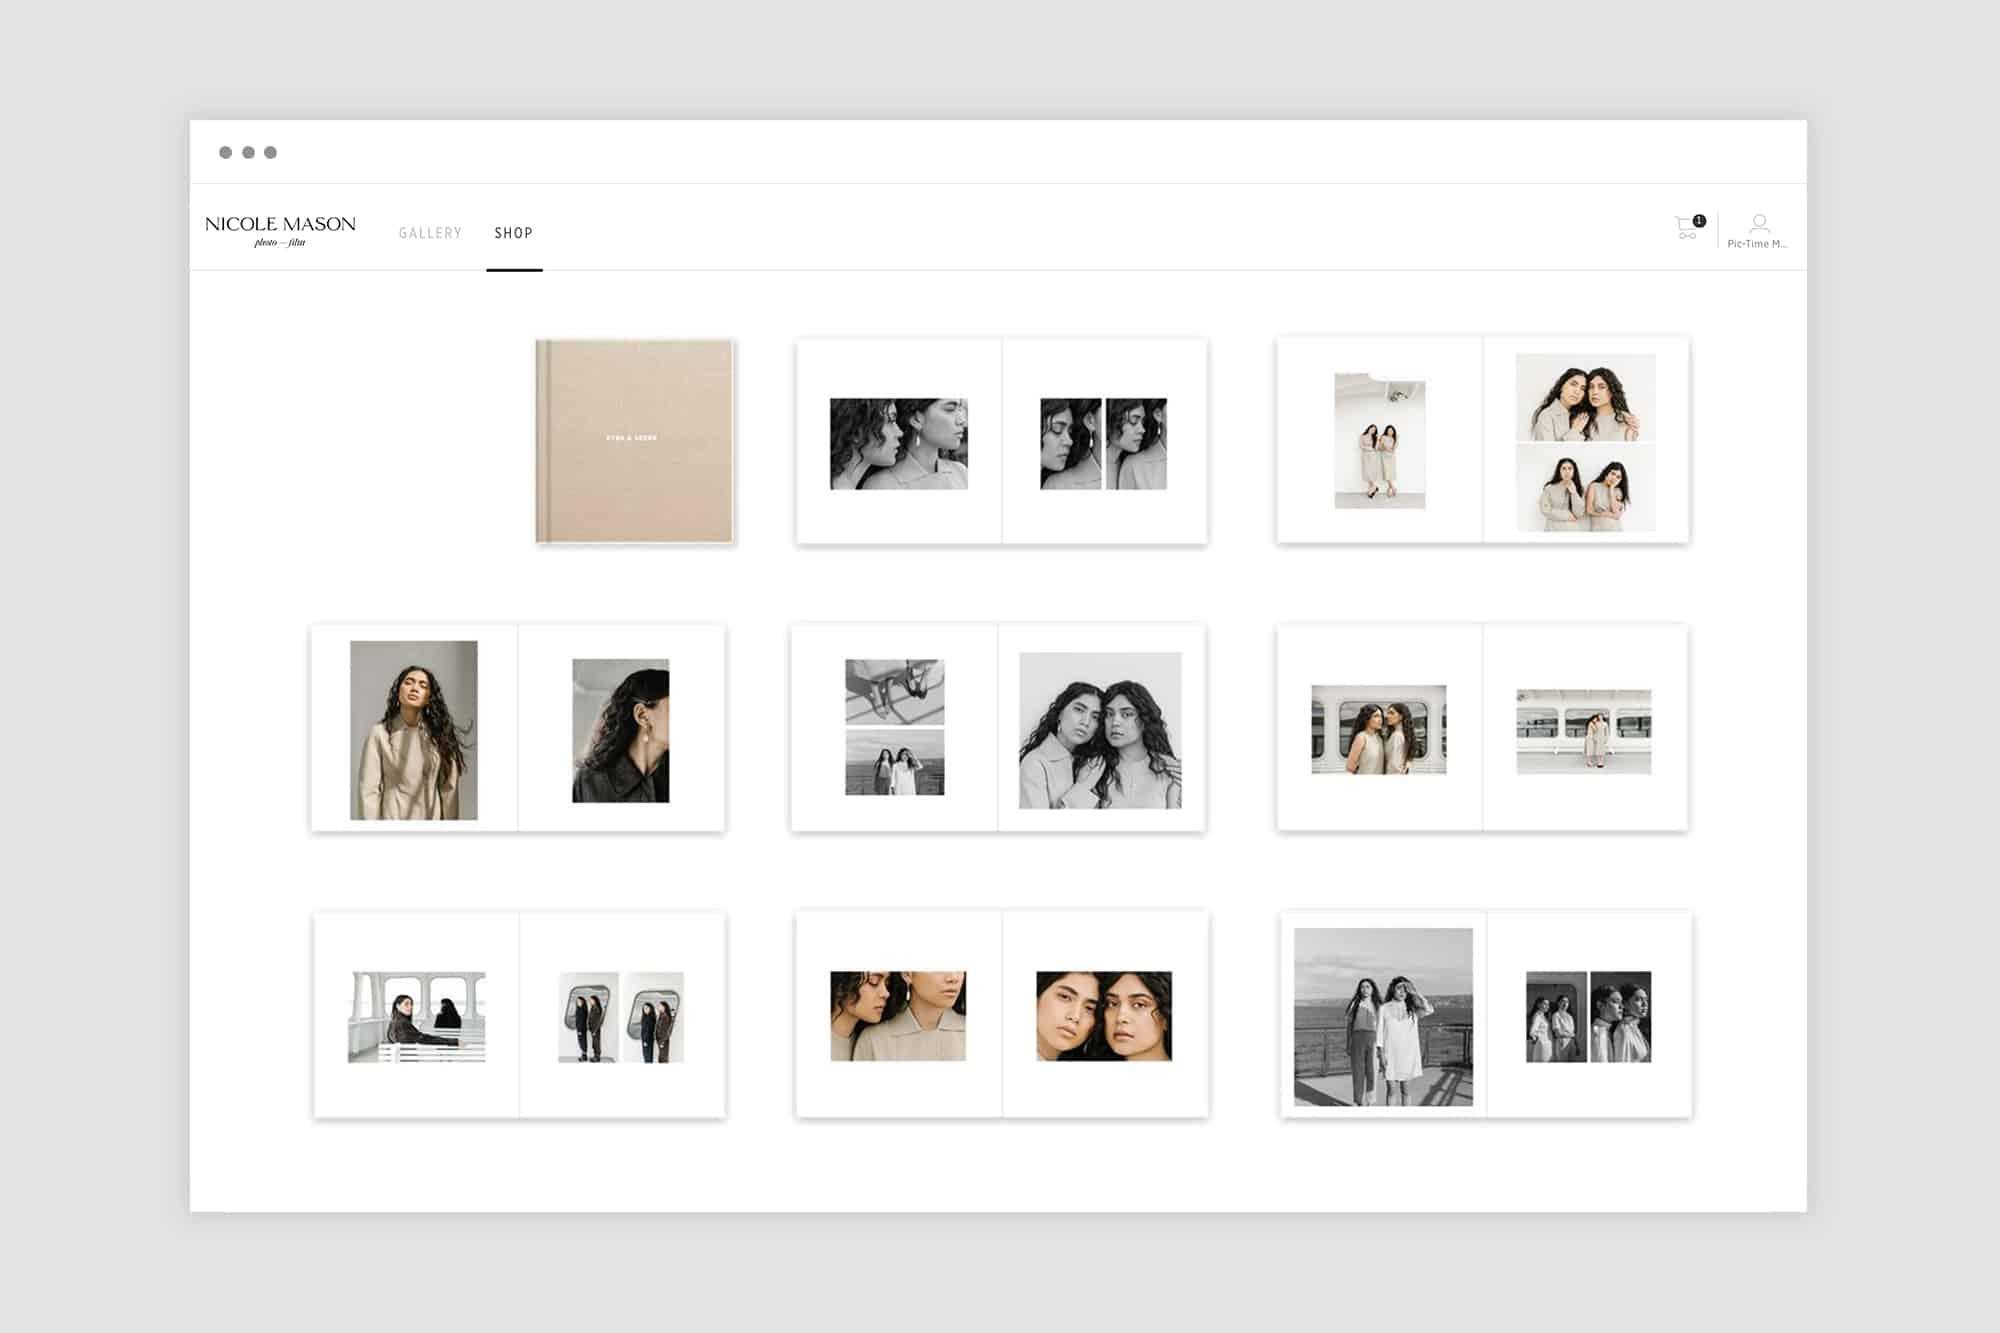 photo albums